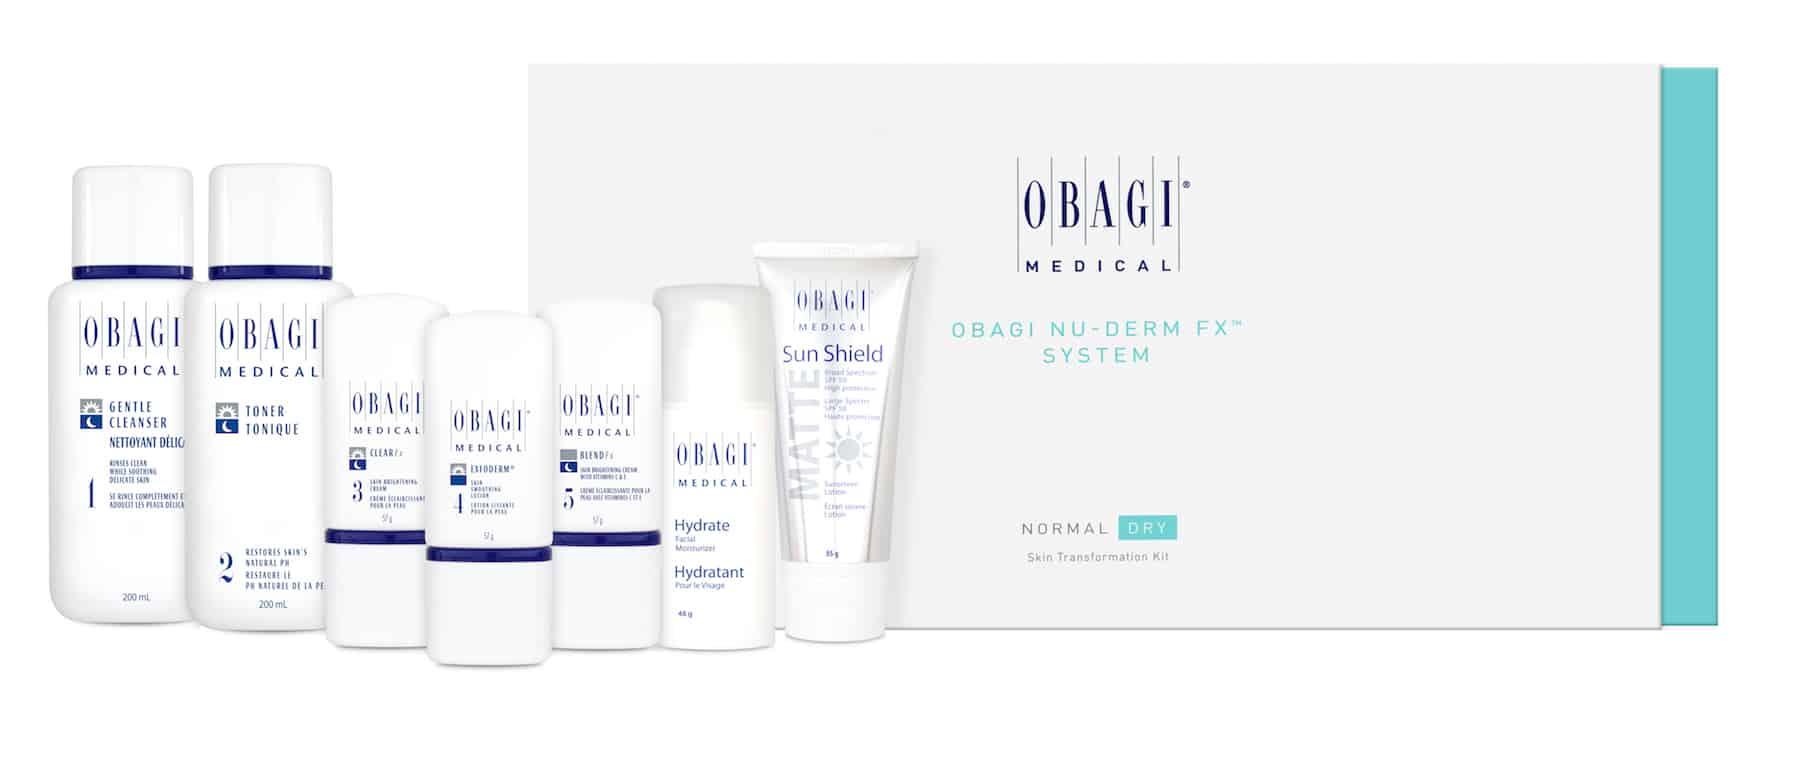 Arriva dagli Usa Obagi Medical, la nuova linea skincare ad uso professionale